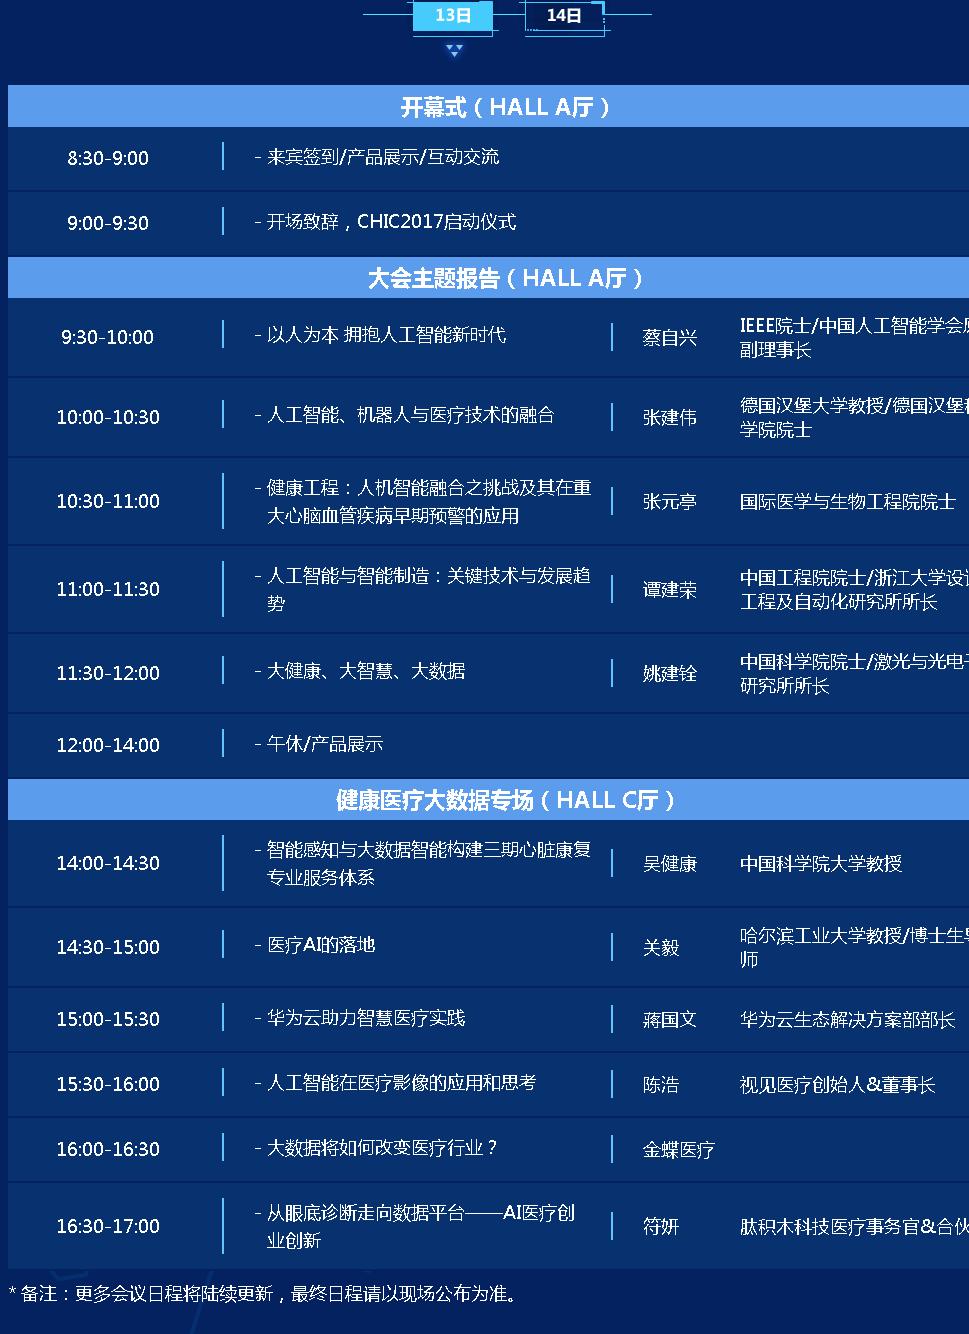 OFweek2017(第二届)中国医疗科技大会今日盛大开幕